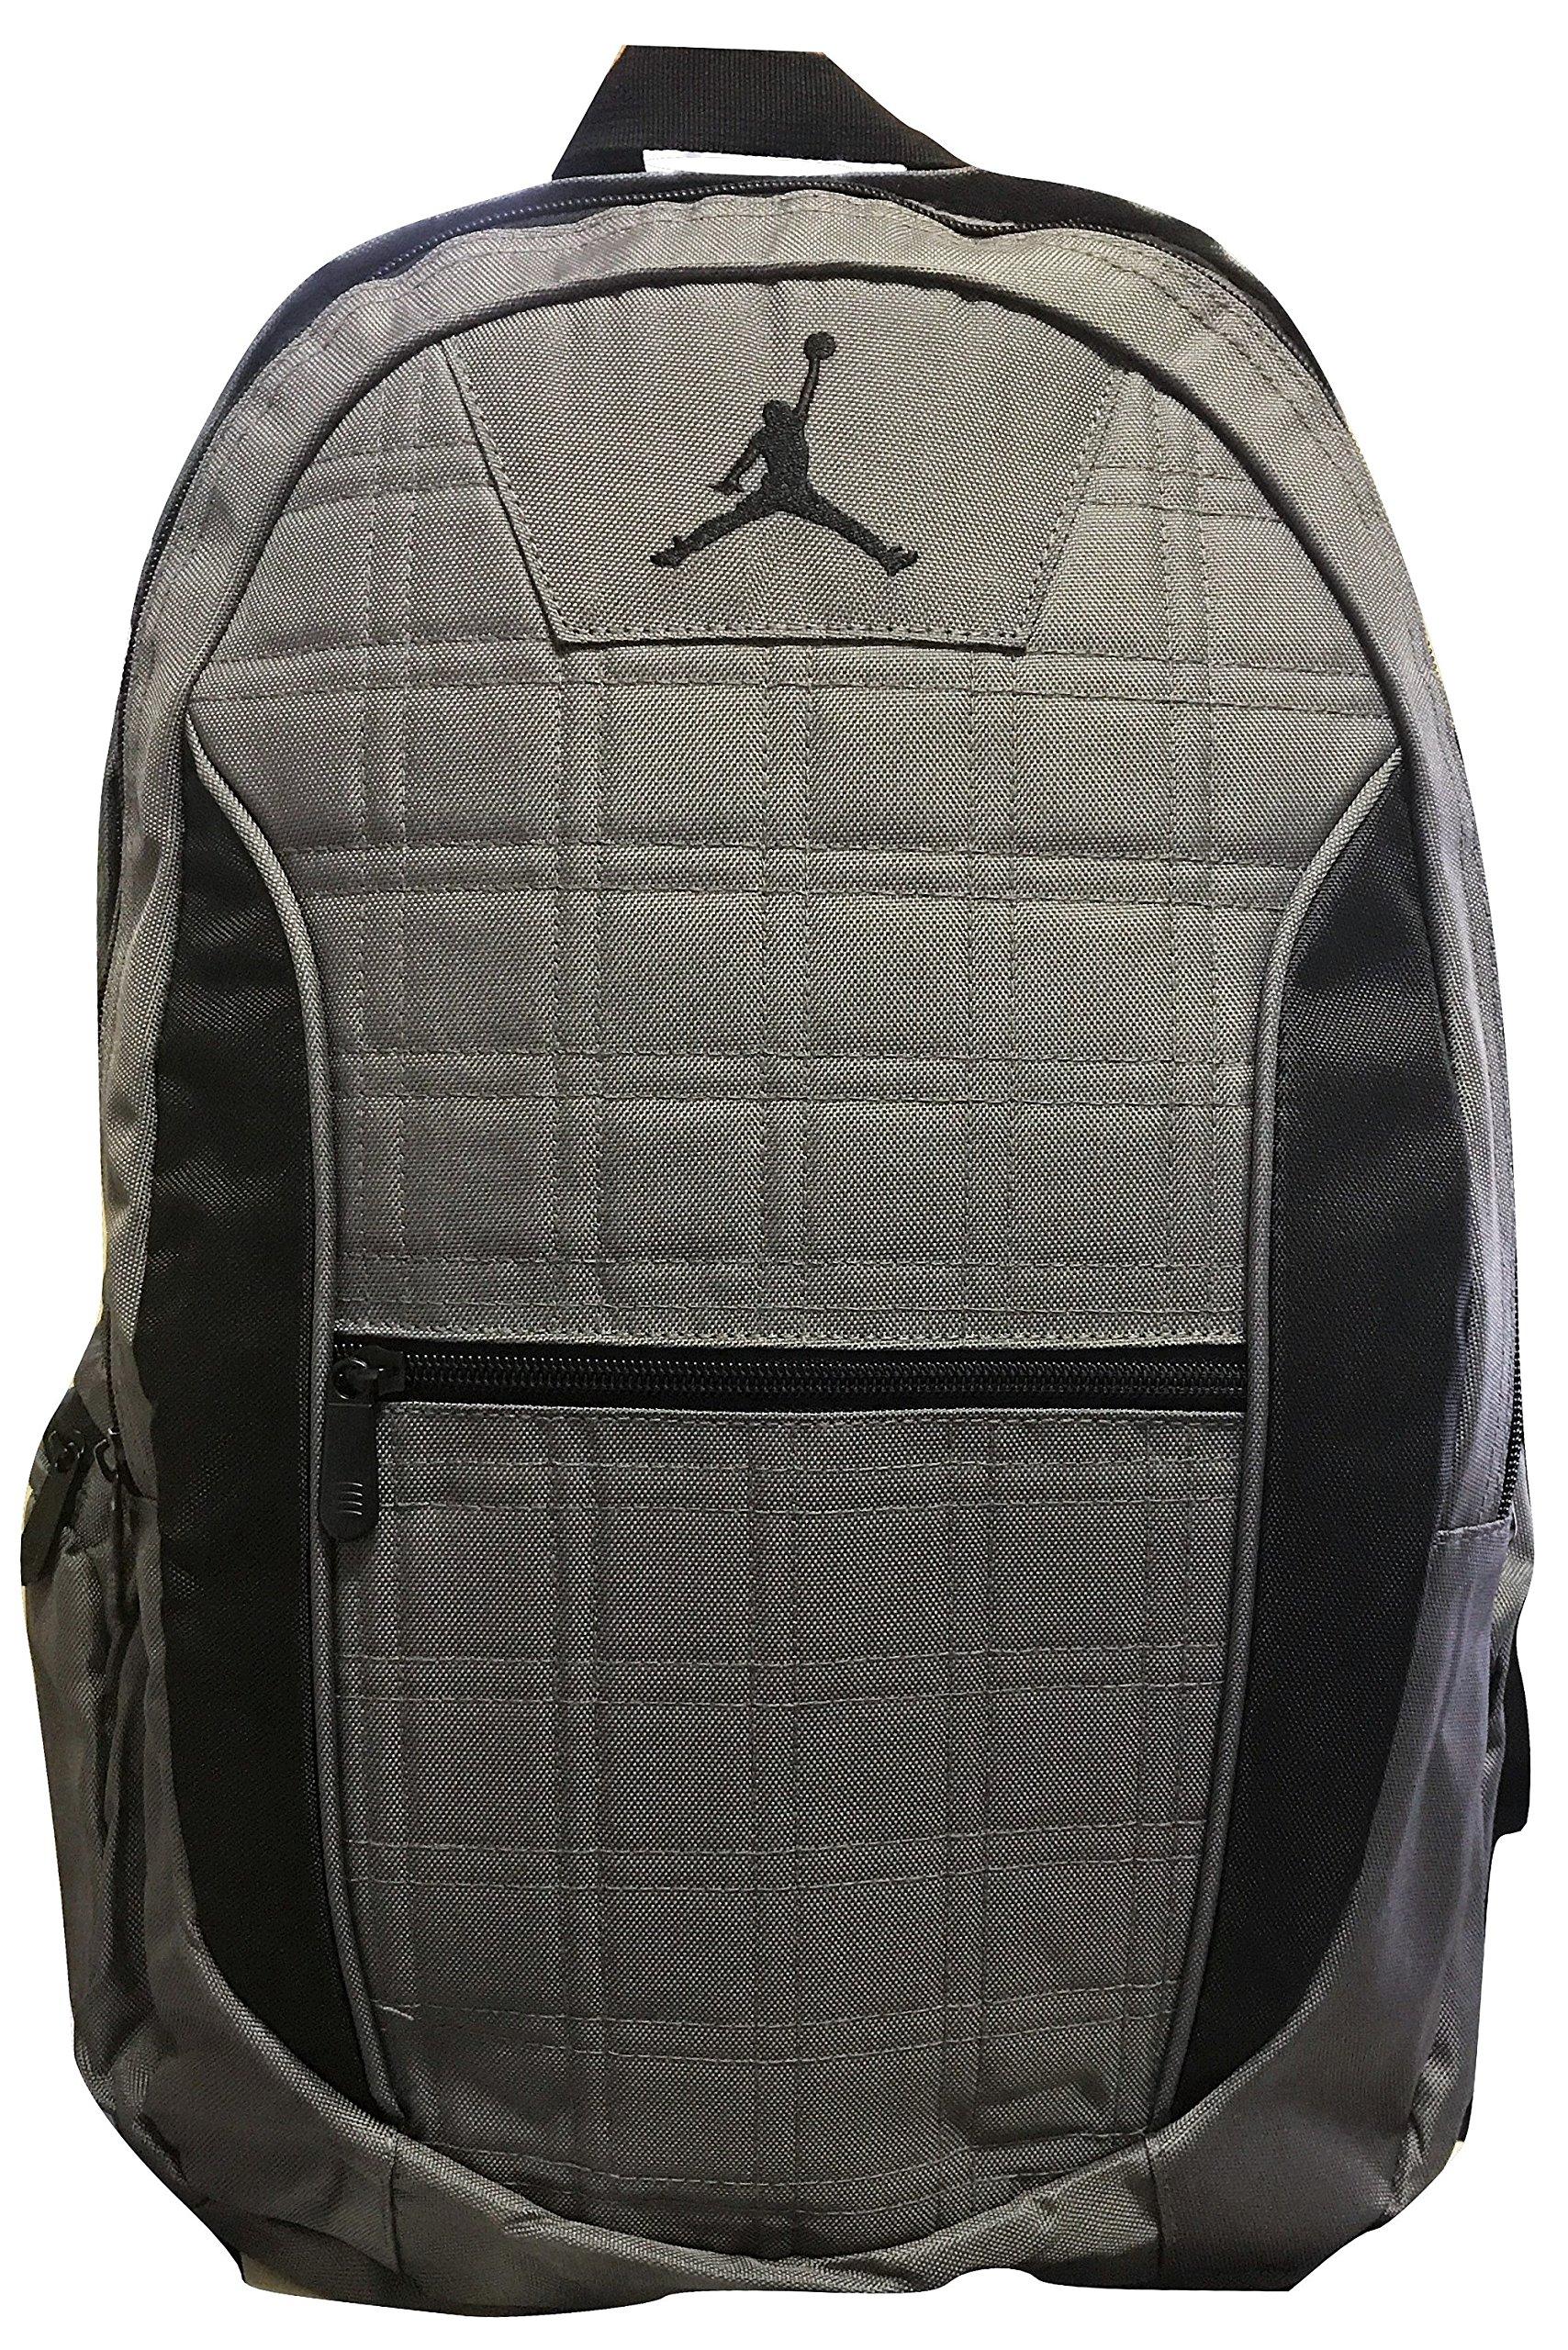 Jordan Grid 2-Strap Backpack - Dark Graphite, One Size (Grey)